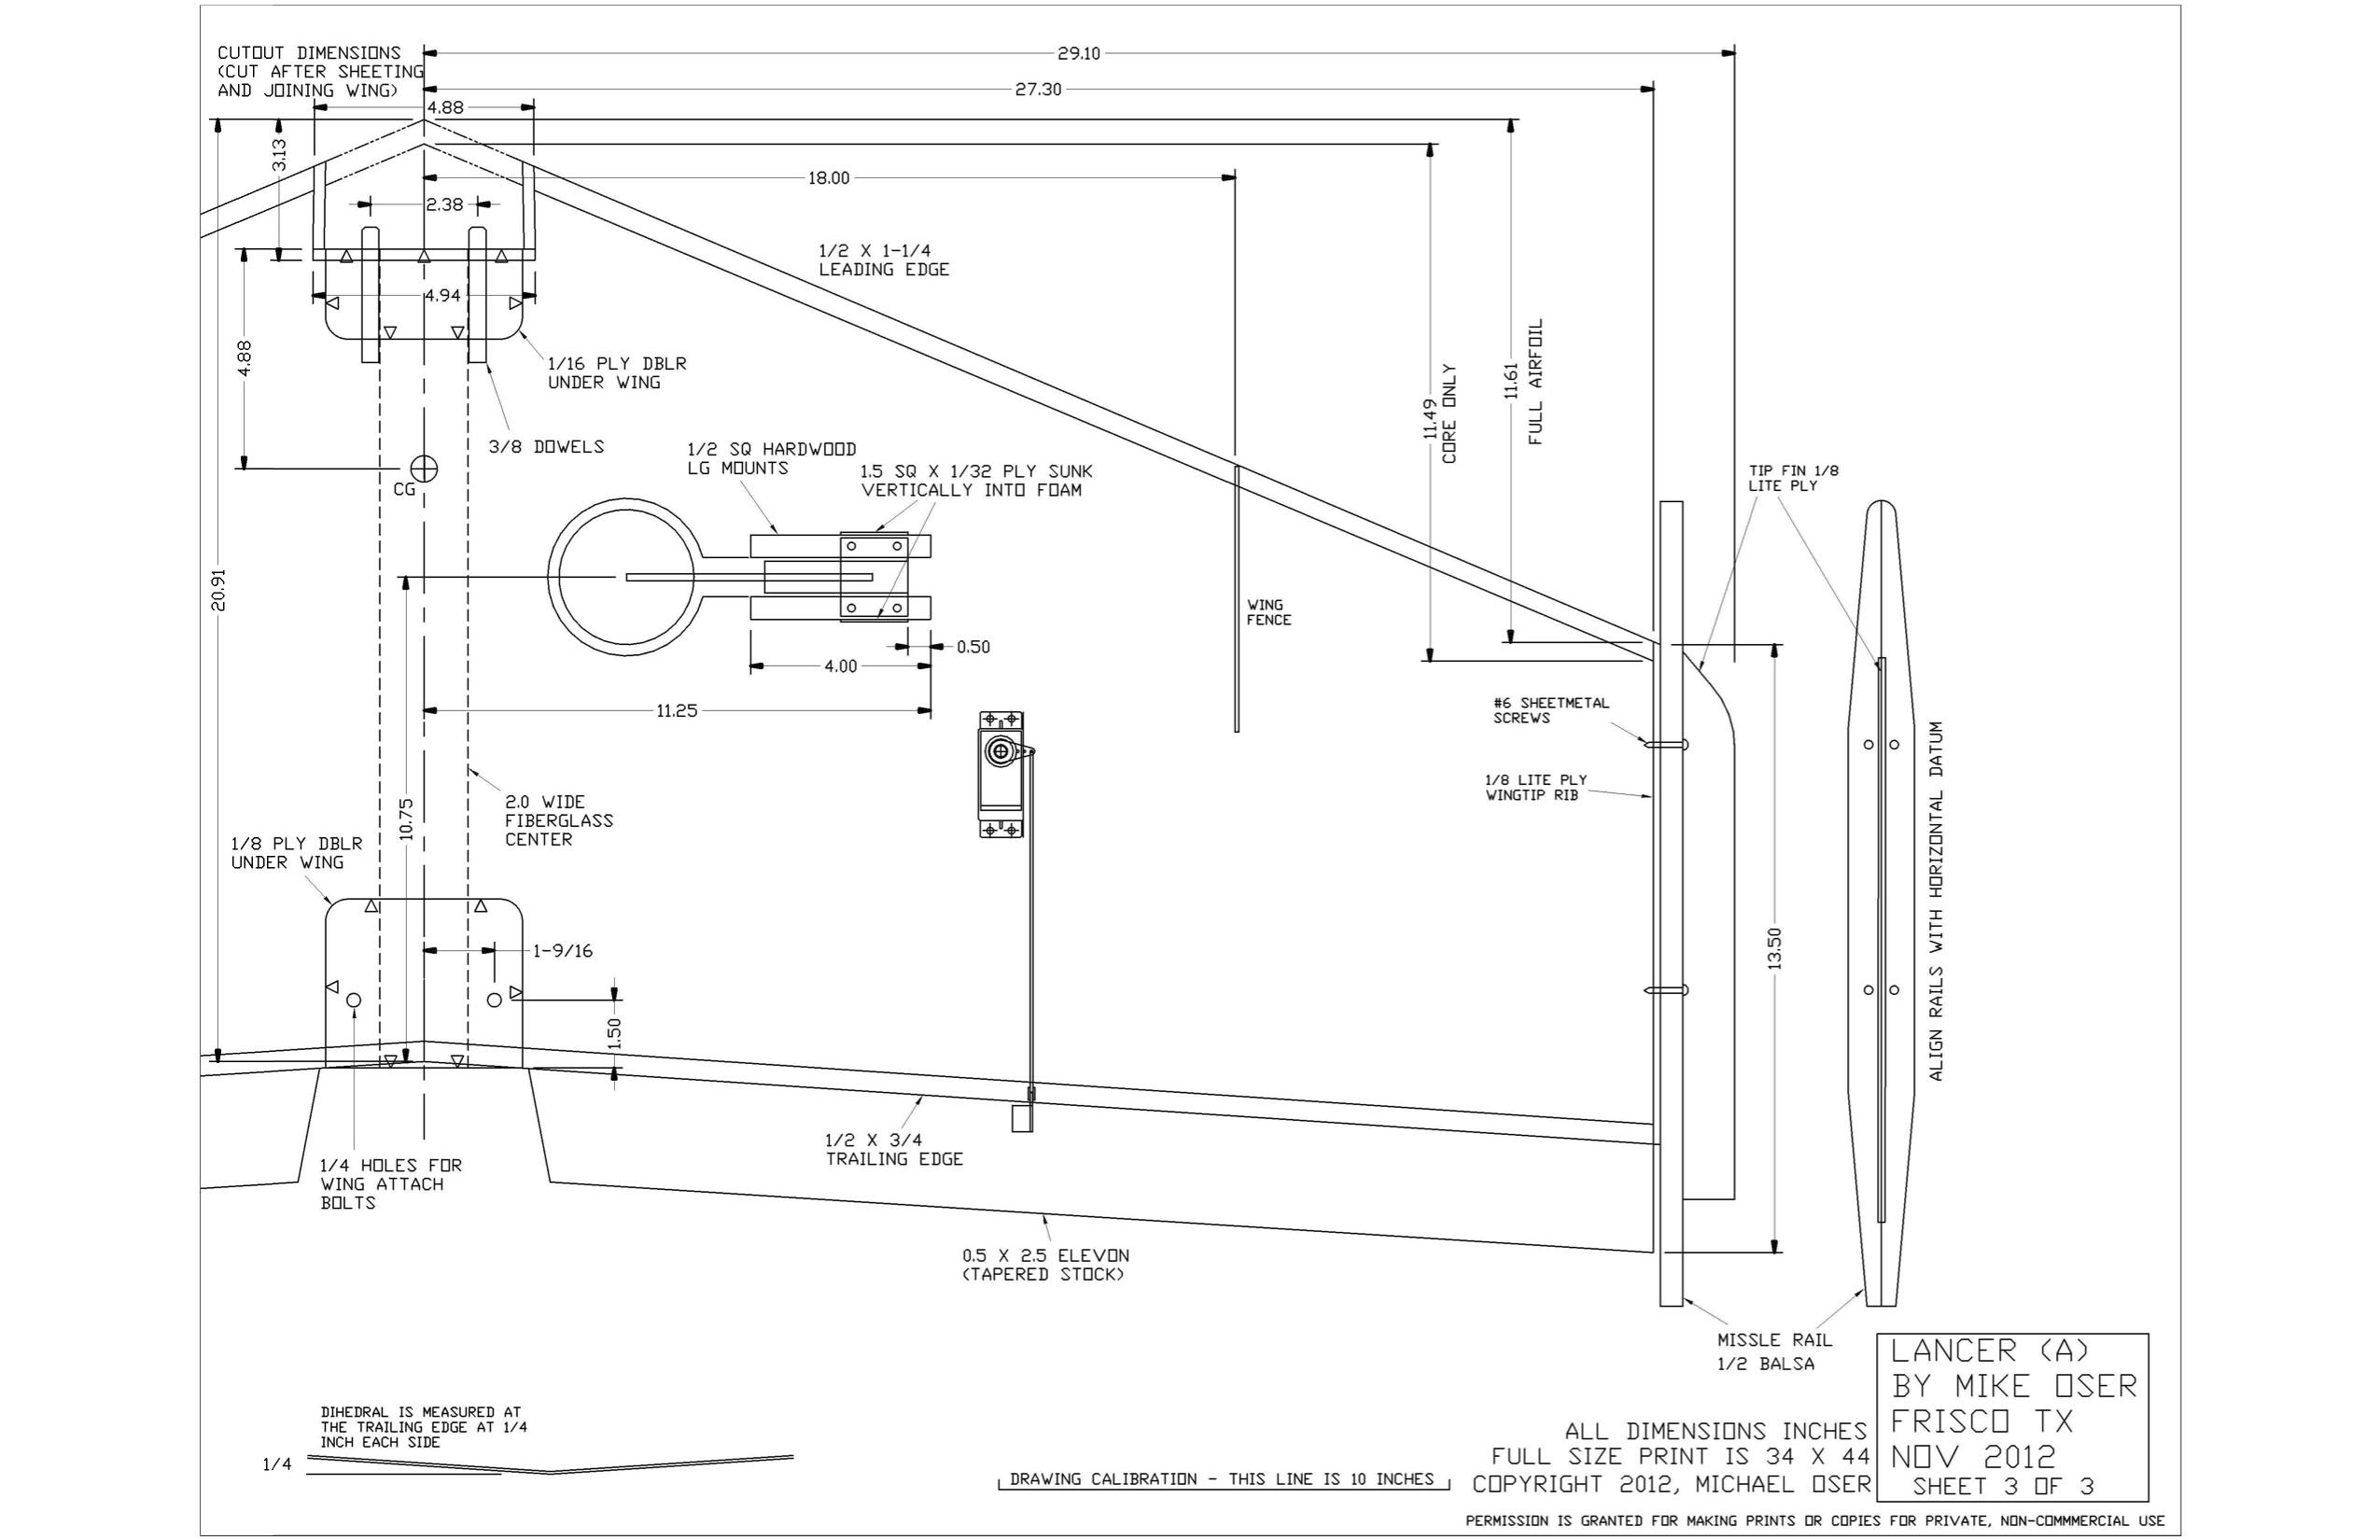 Click image for larger version  Name:Lancer Sht 3 (11x17).jpg Views:1028 Size:418.8 KB ID:2064273